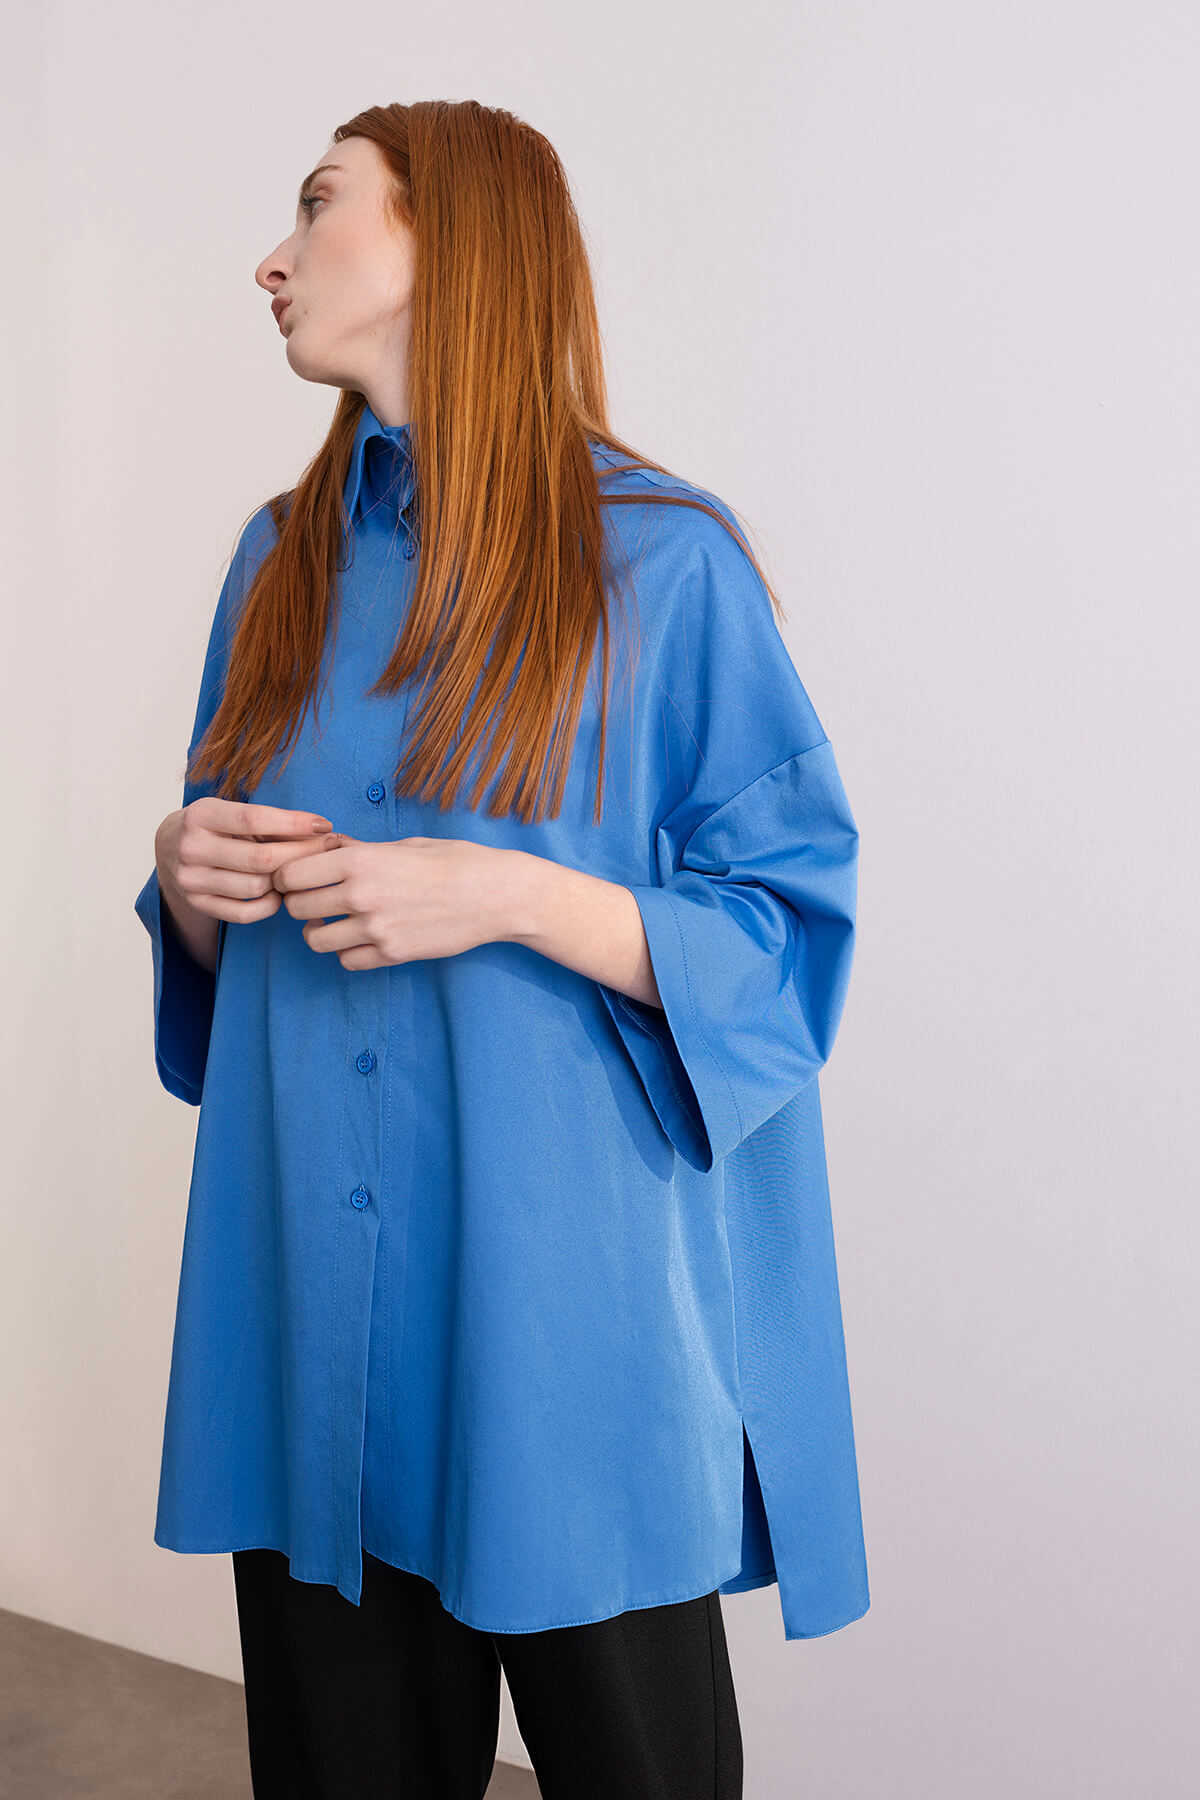 Kuaybe Gider - 5116 Tunik Mavi